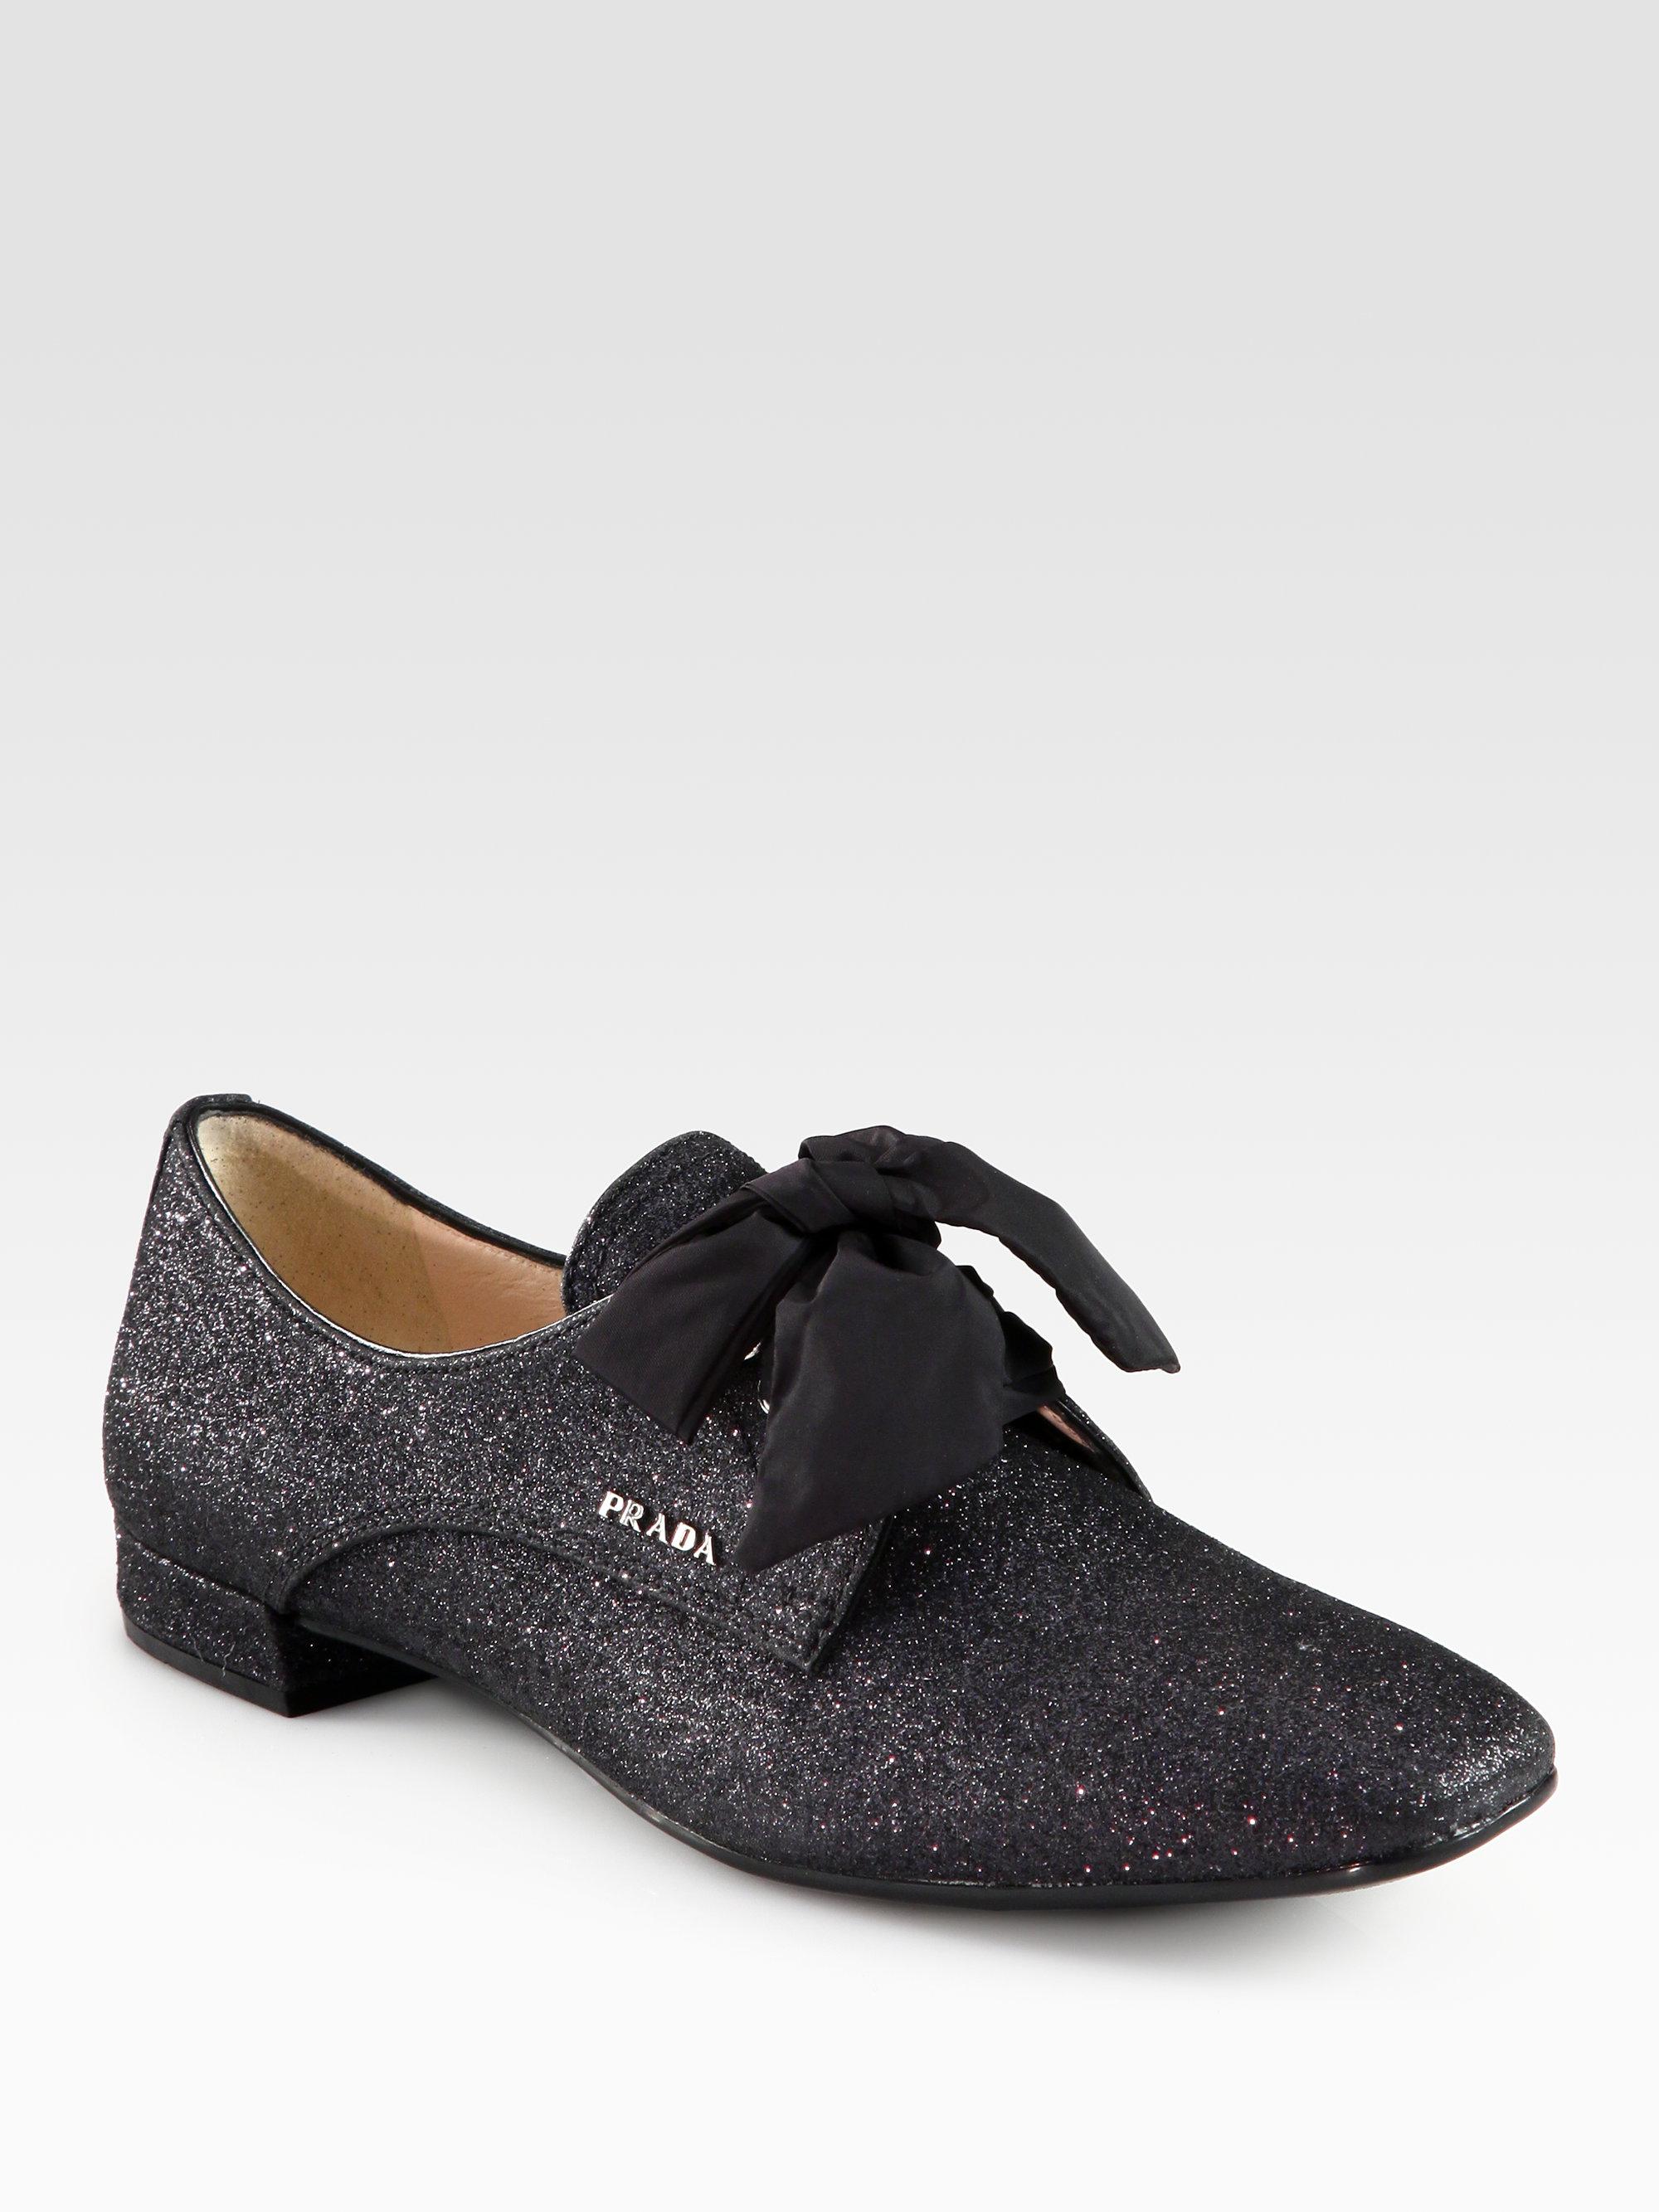 Prada Glitter Oxfords In Black | Lyst